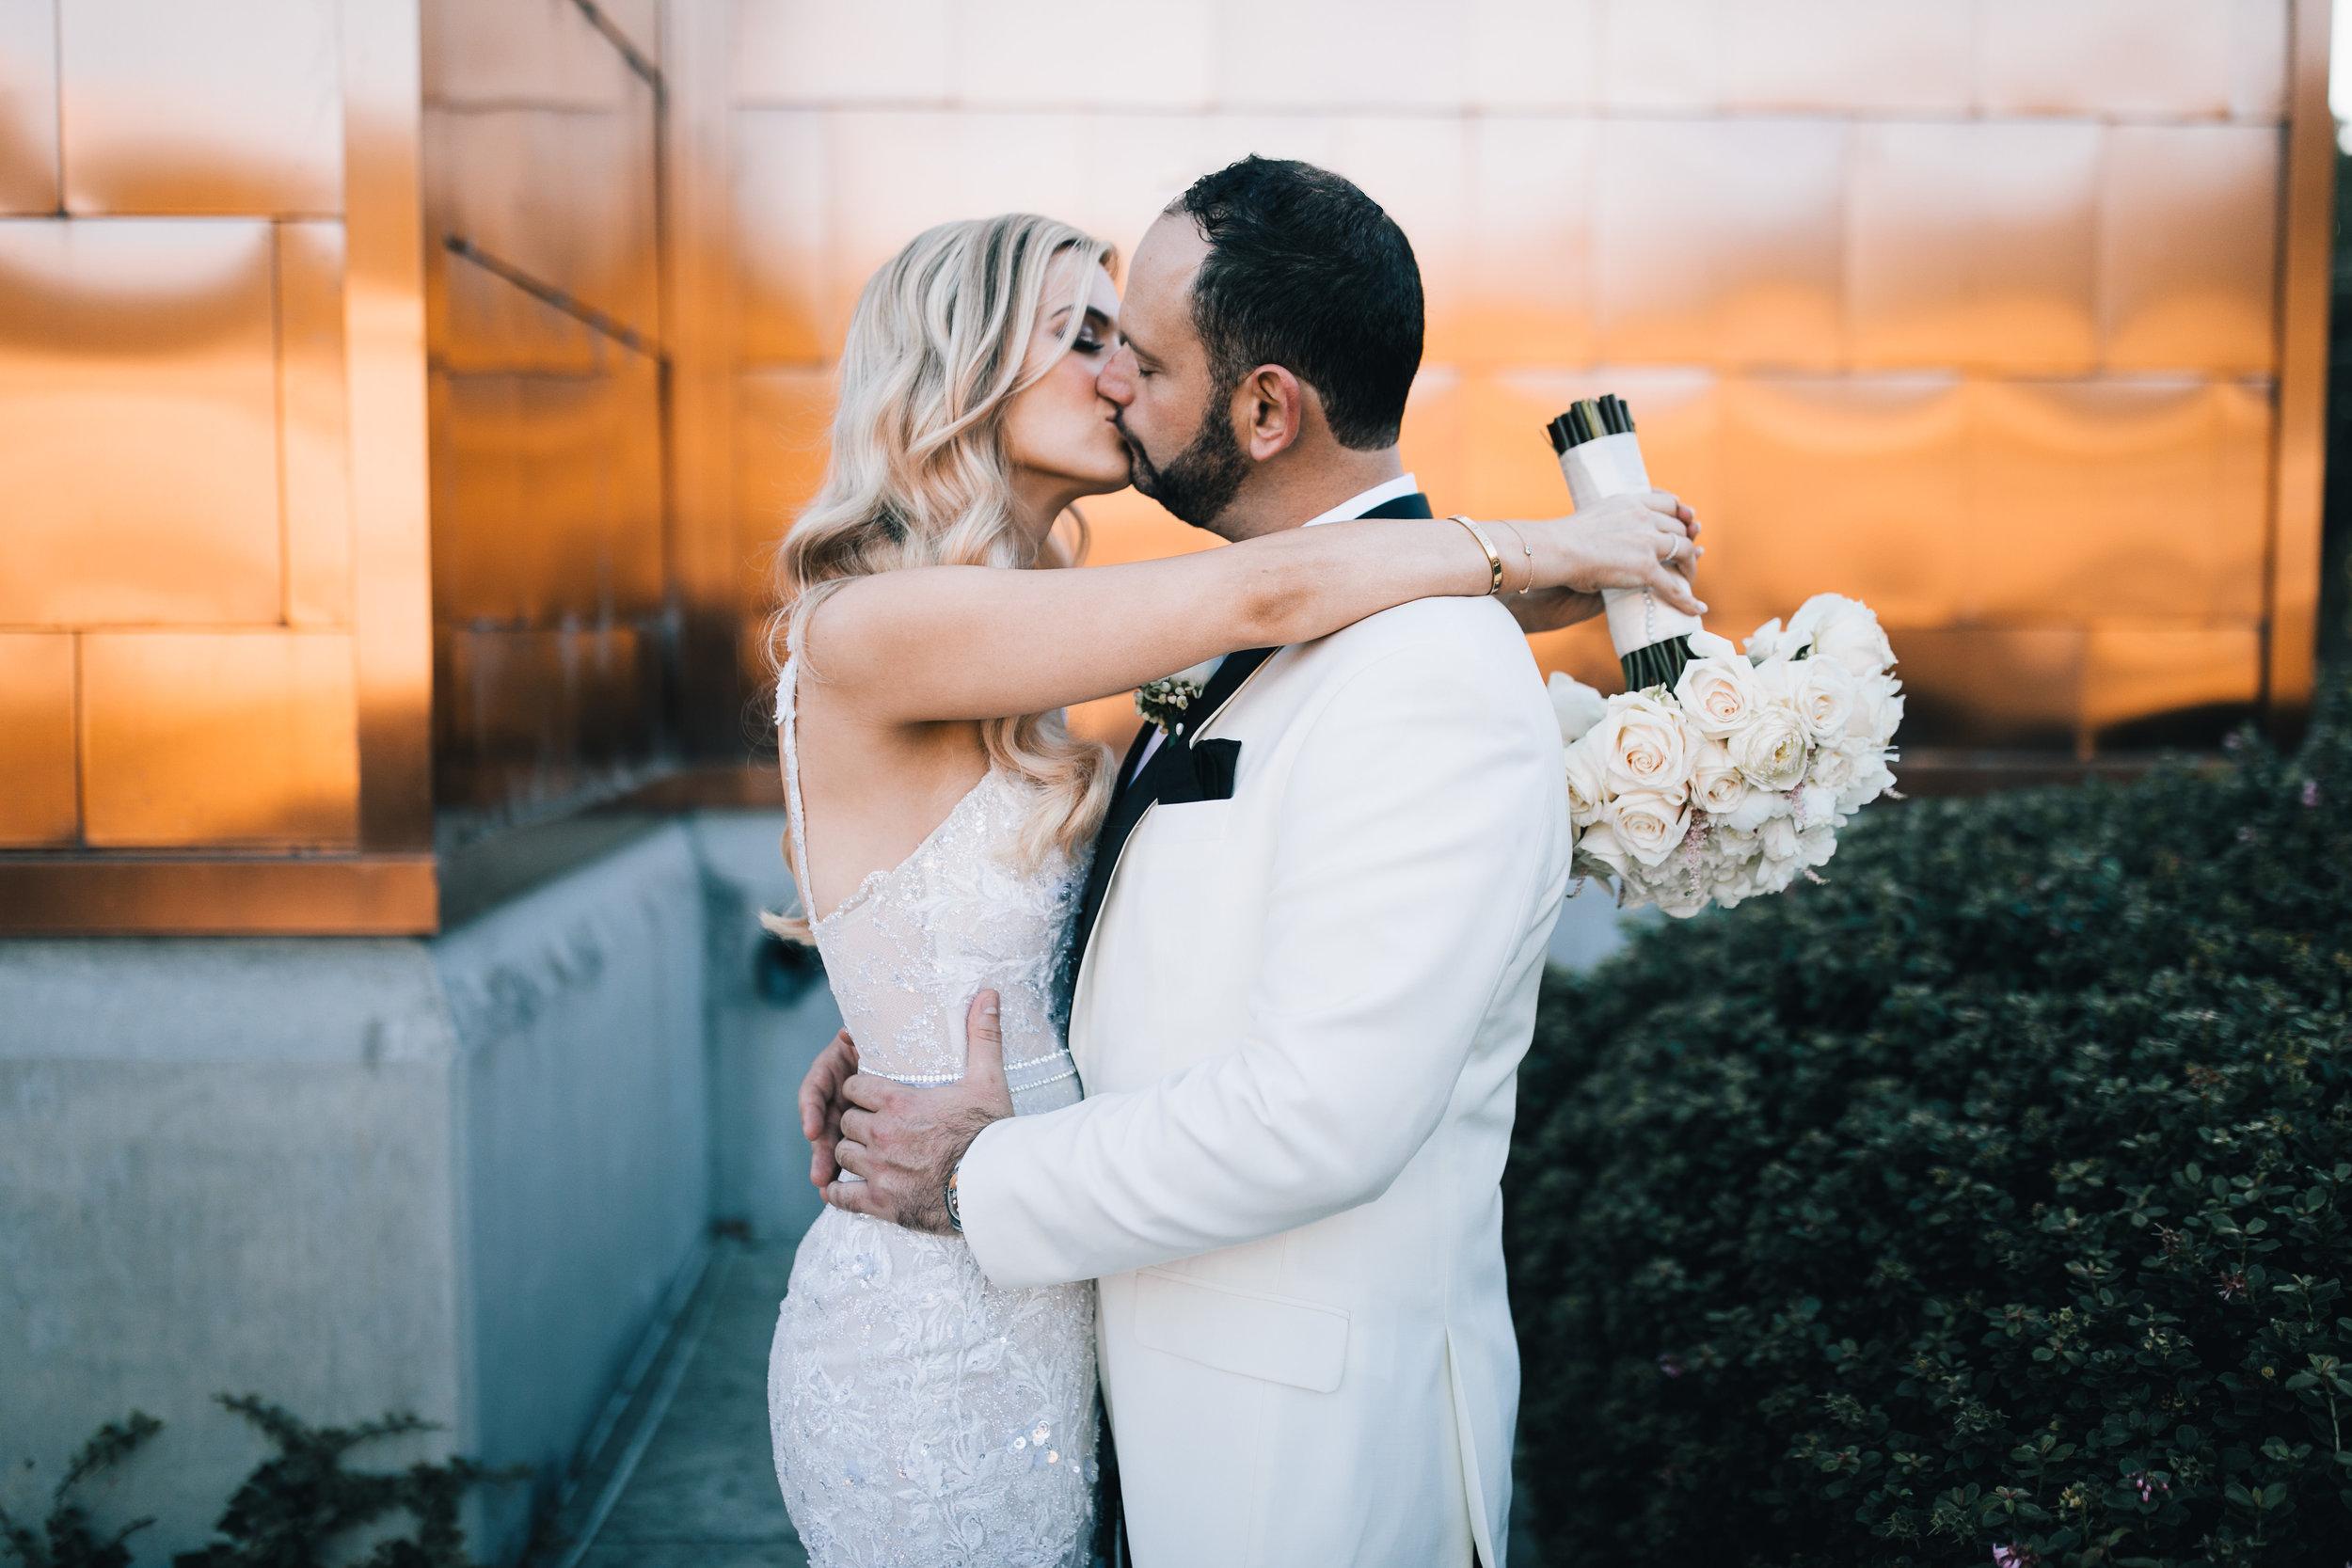 2018.09.08 Litsa and Sofo Greek Wedding Sneak Peak-12.jpg